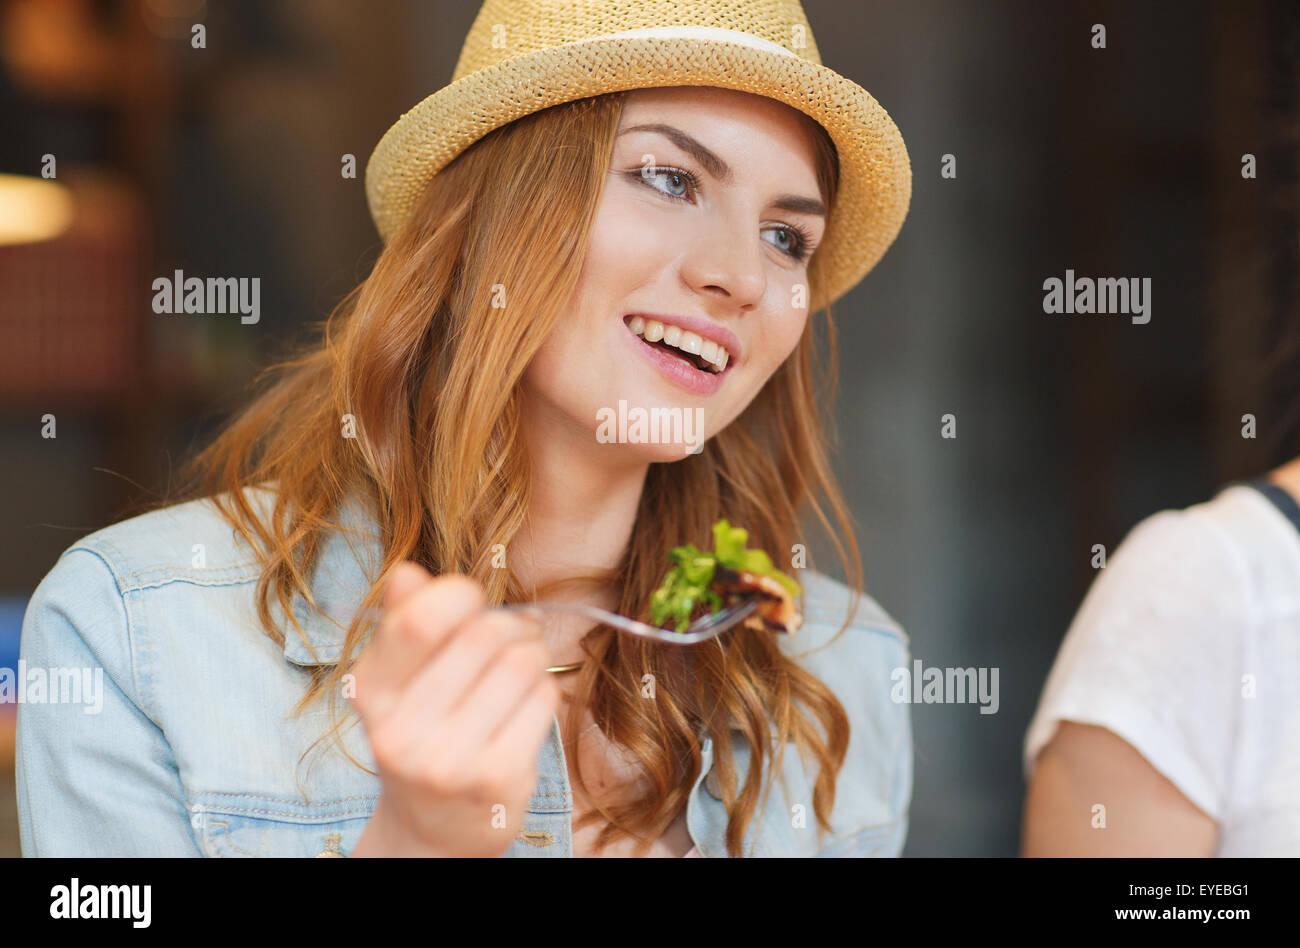 Feliz joven comer ensalada en el bar o pub Imagen De Stock